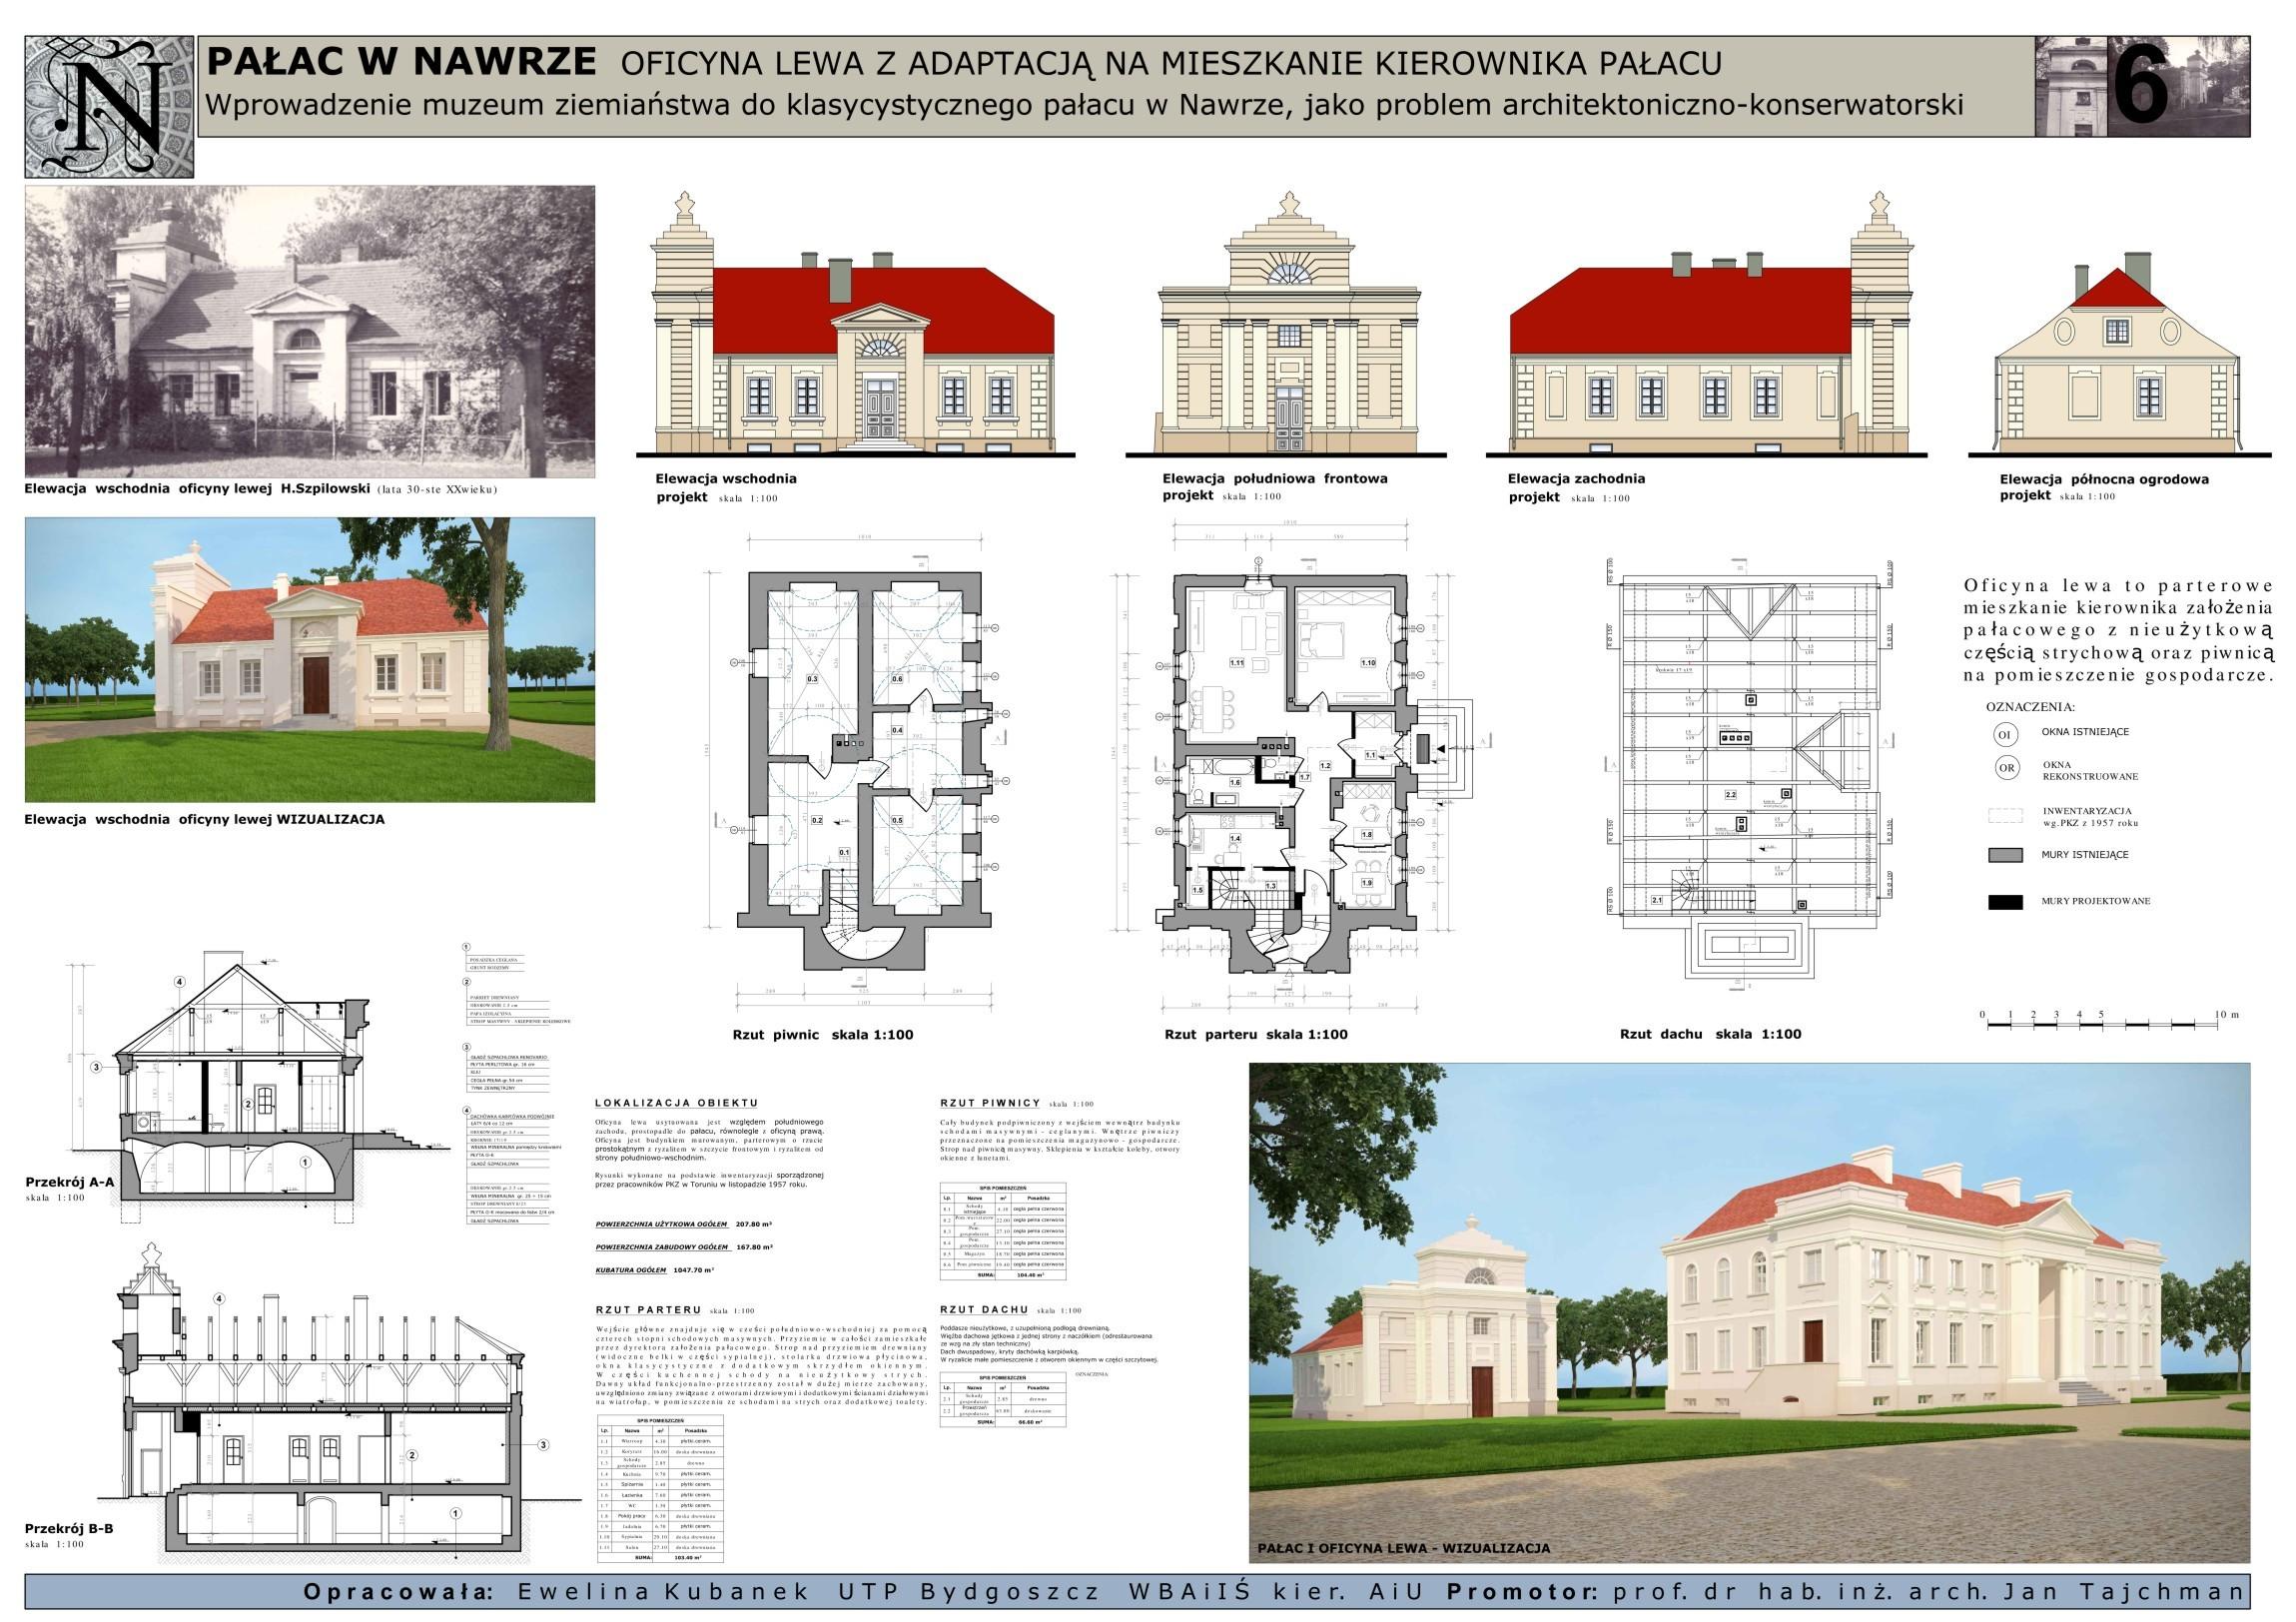 nawra-palac